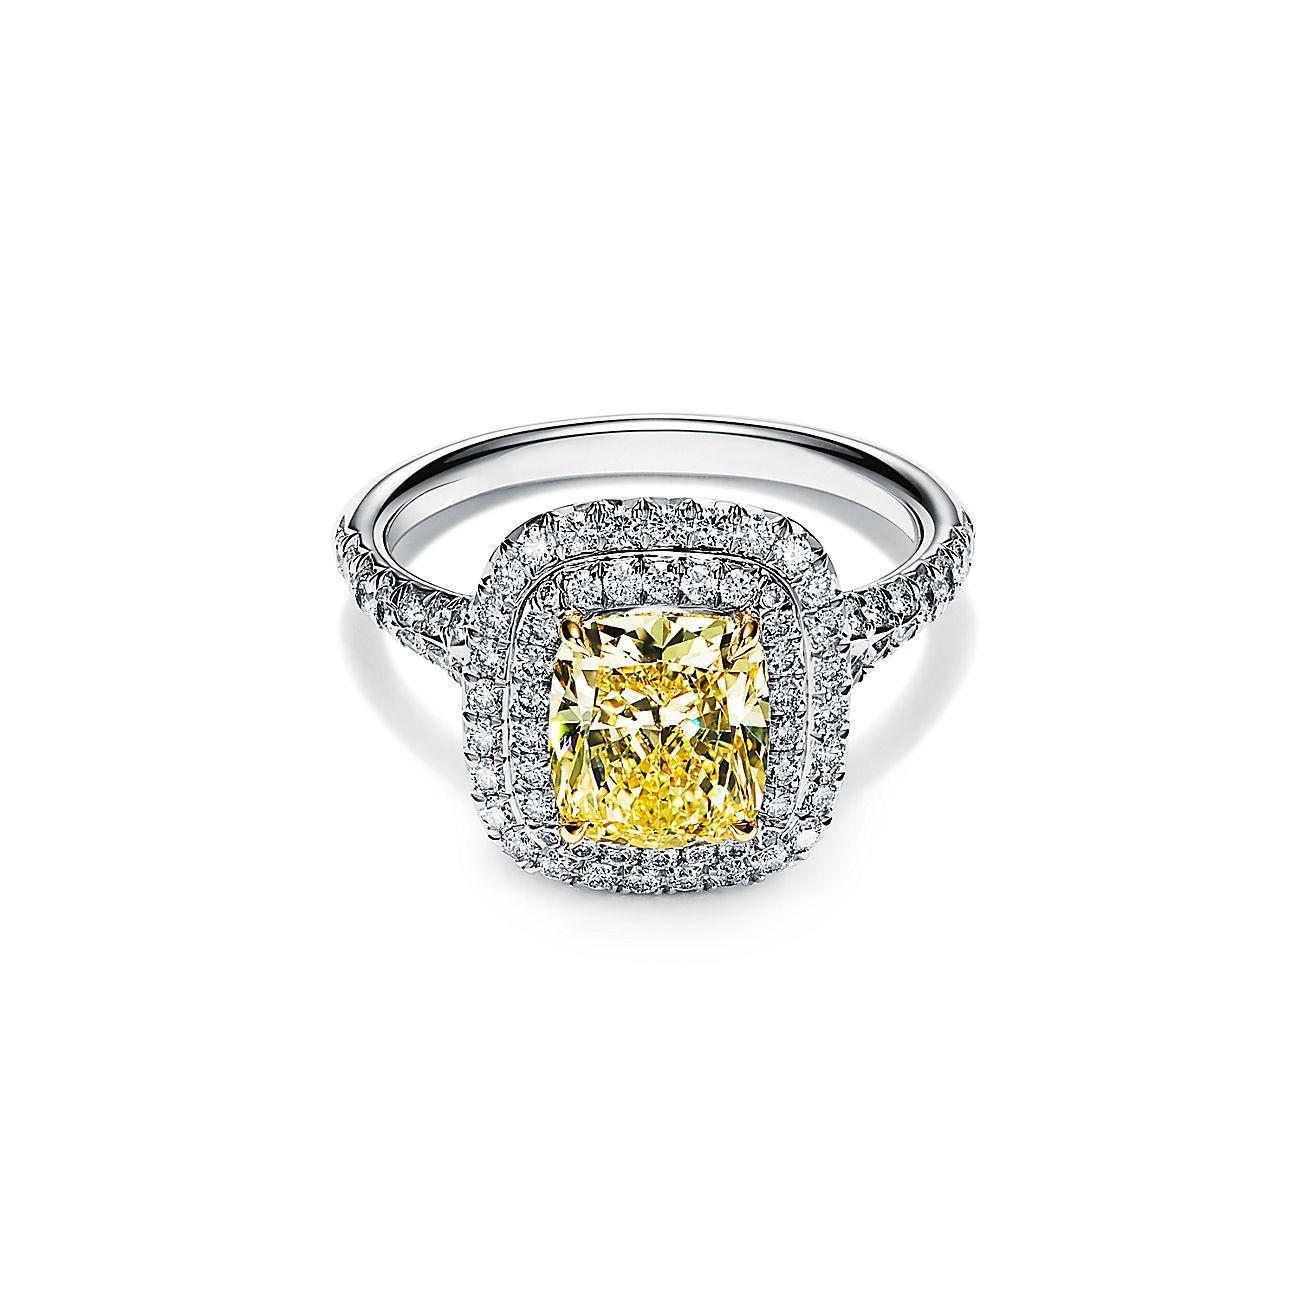 Tiffany Soleste Cushion Cut Yellow Diamond Halo Engagement Ring In Platinum